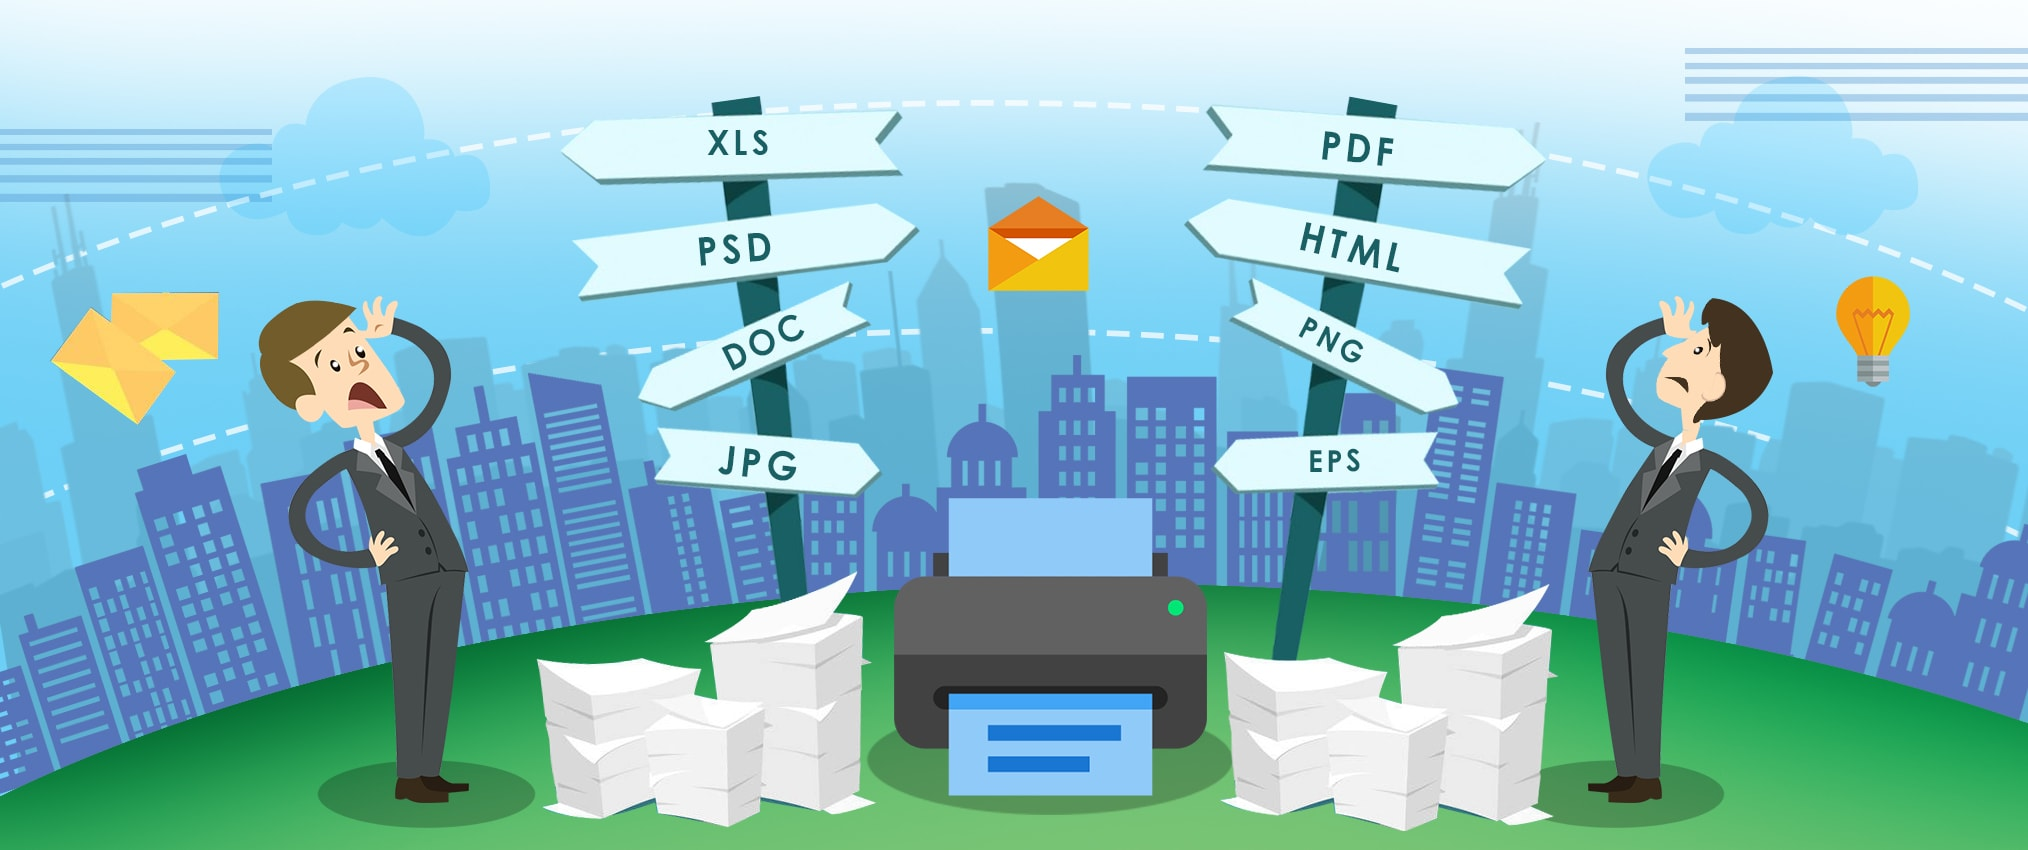 paper-vs-digital-for-business-processes